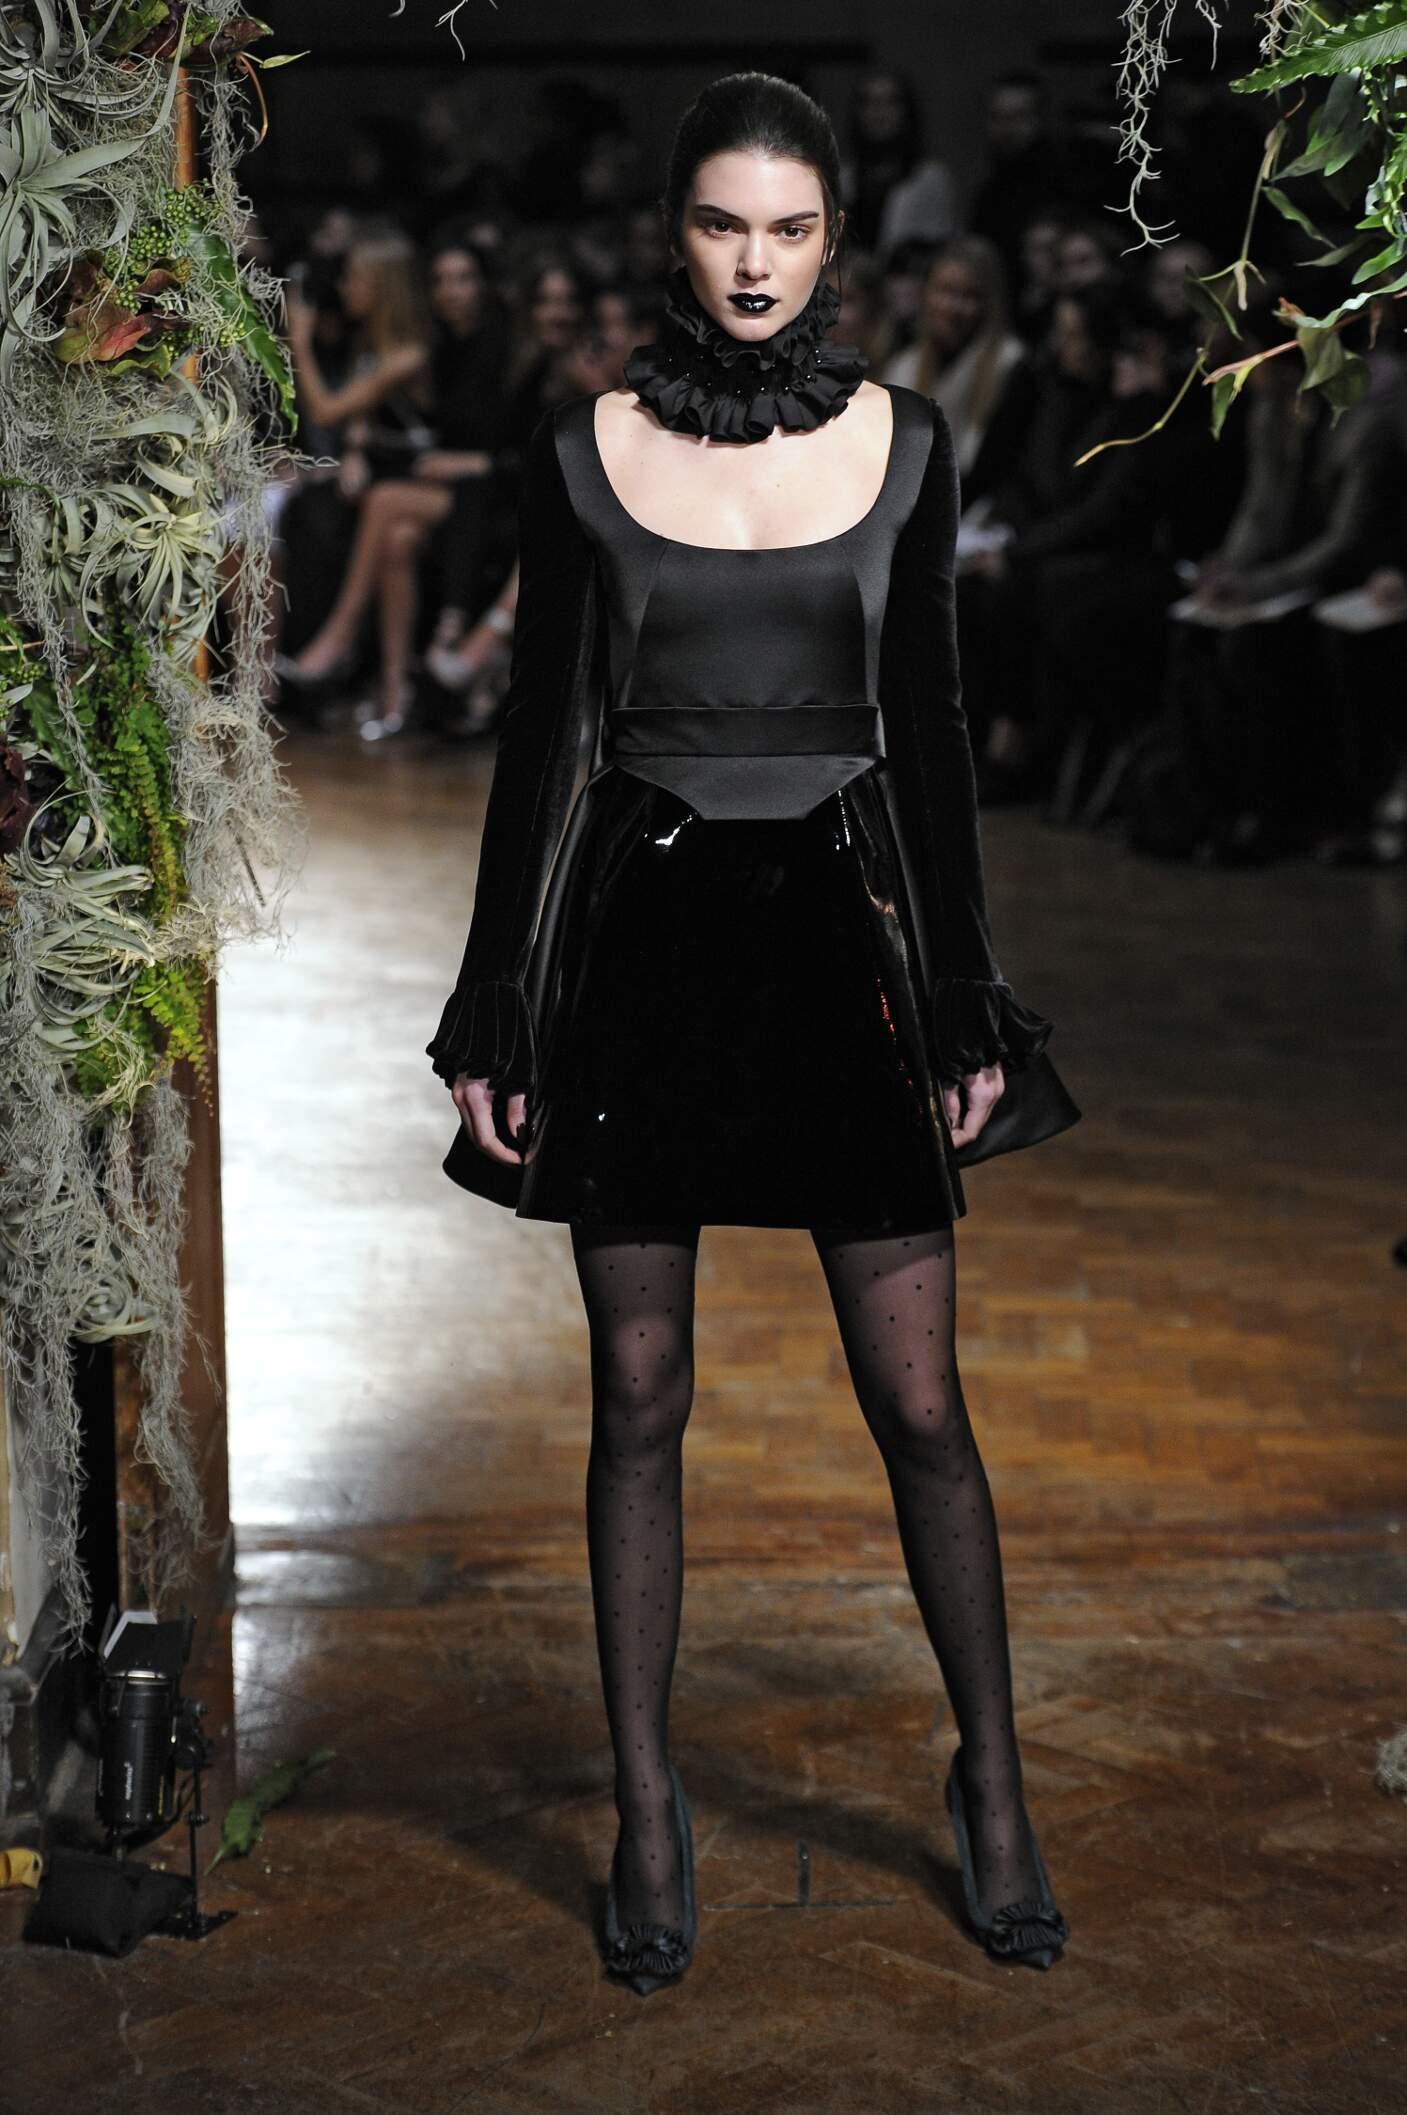 Kendall jenner en las Semanas de la Moda